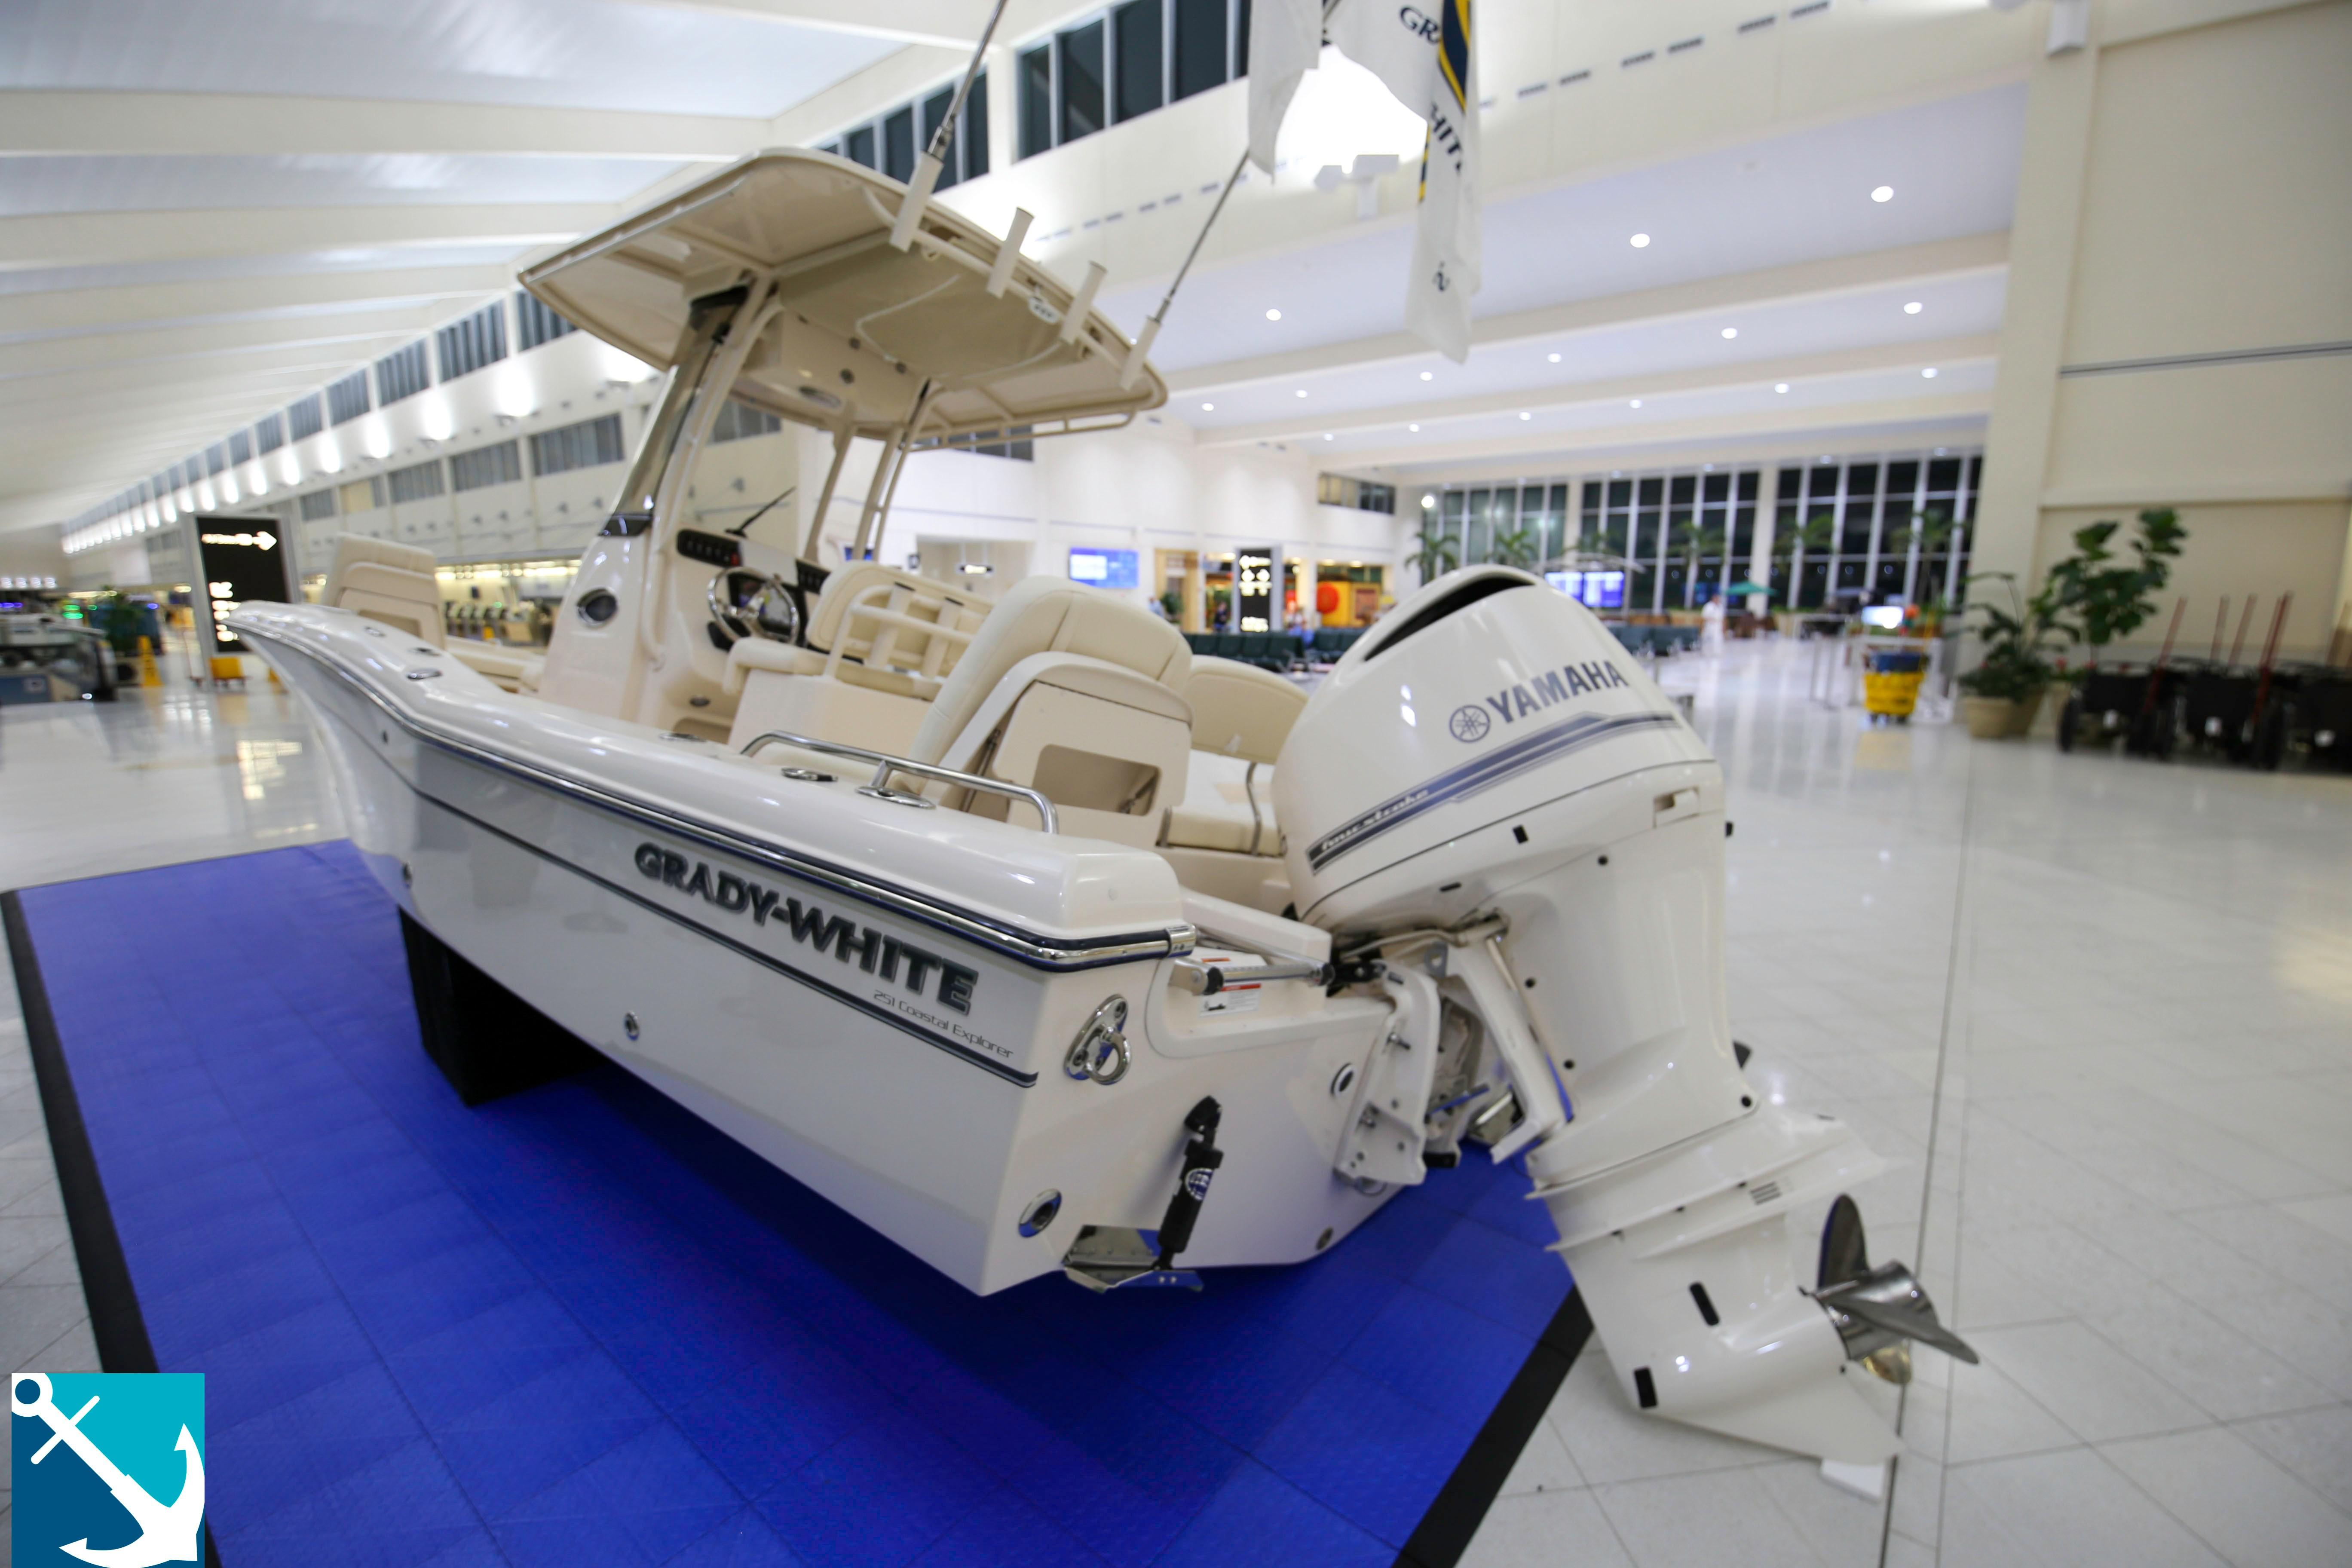 Grady-White 251 Coastal Explorer 2020 3